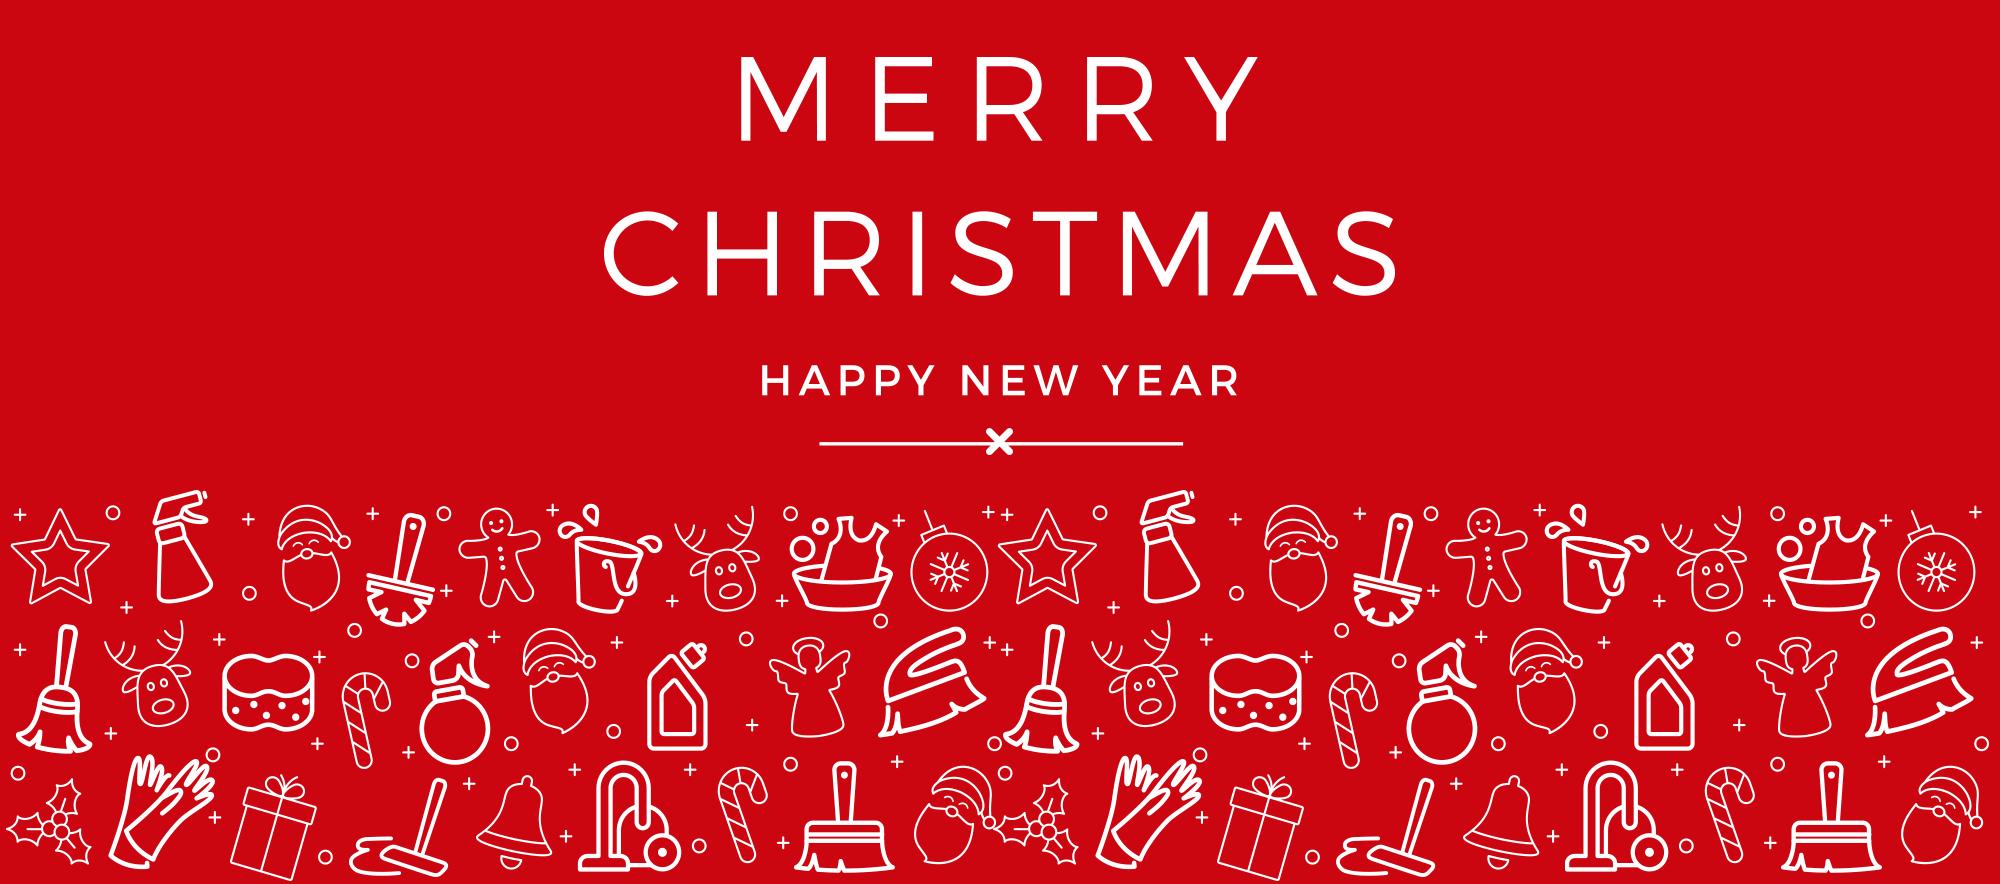 Jangro-Merry-Christmas-End-Of-Year-Blog-2018